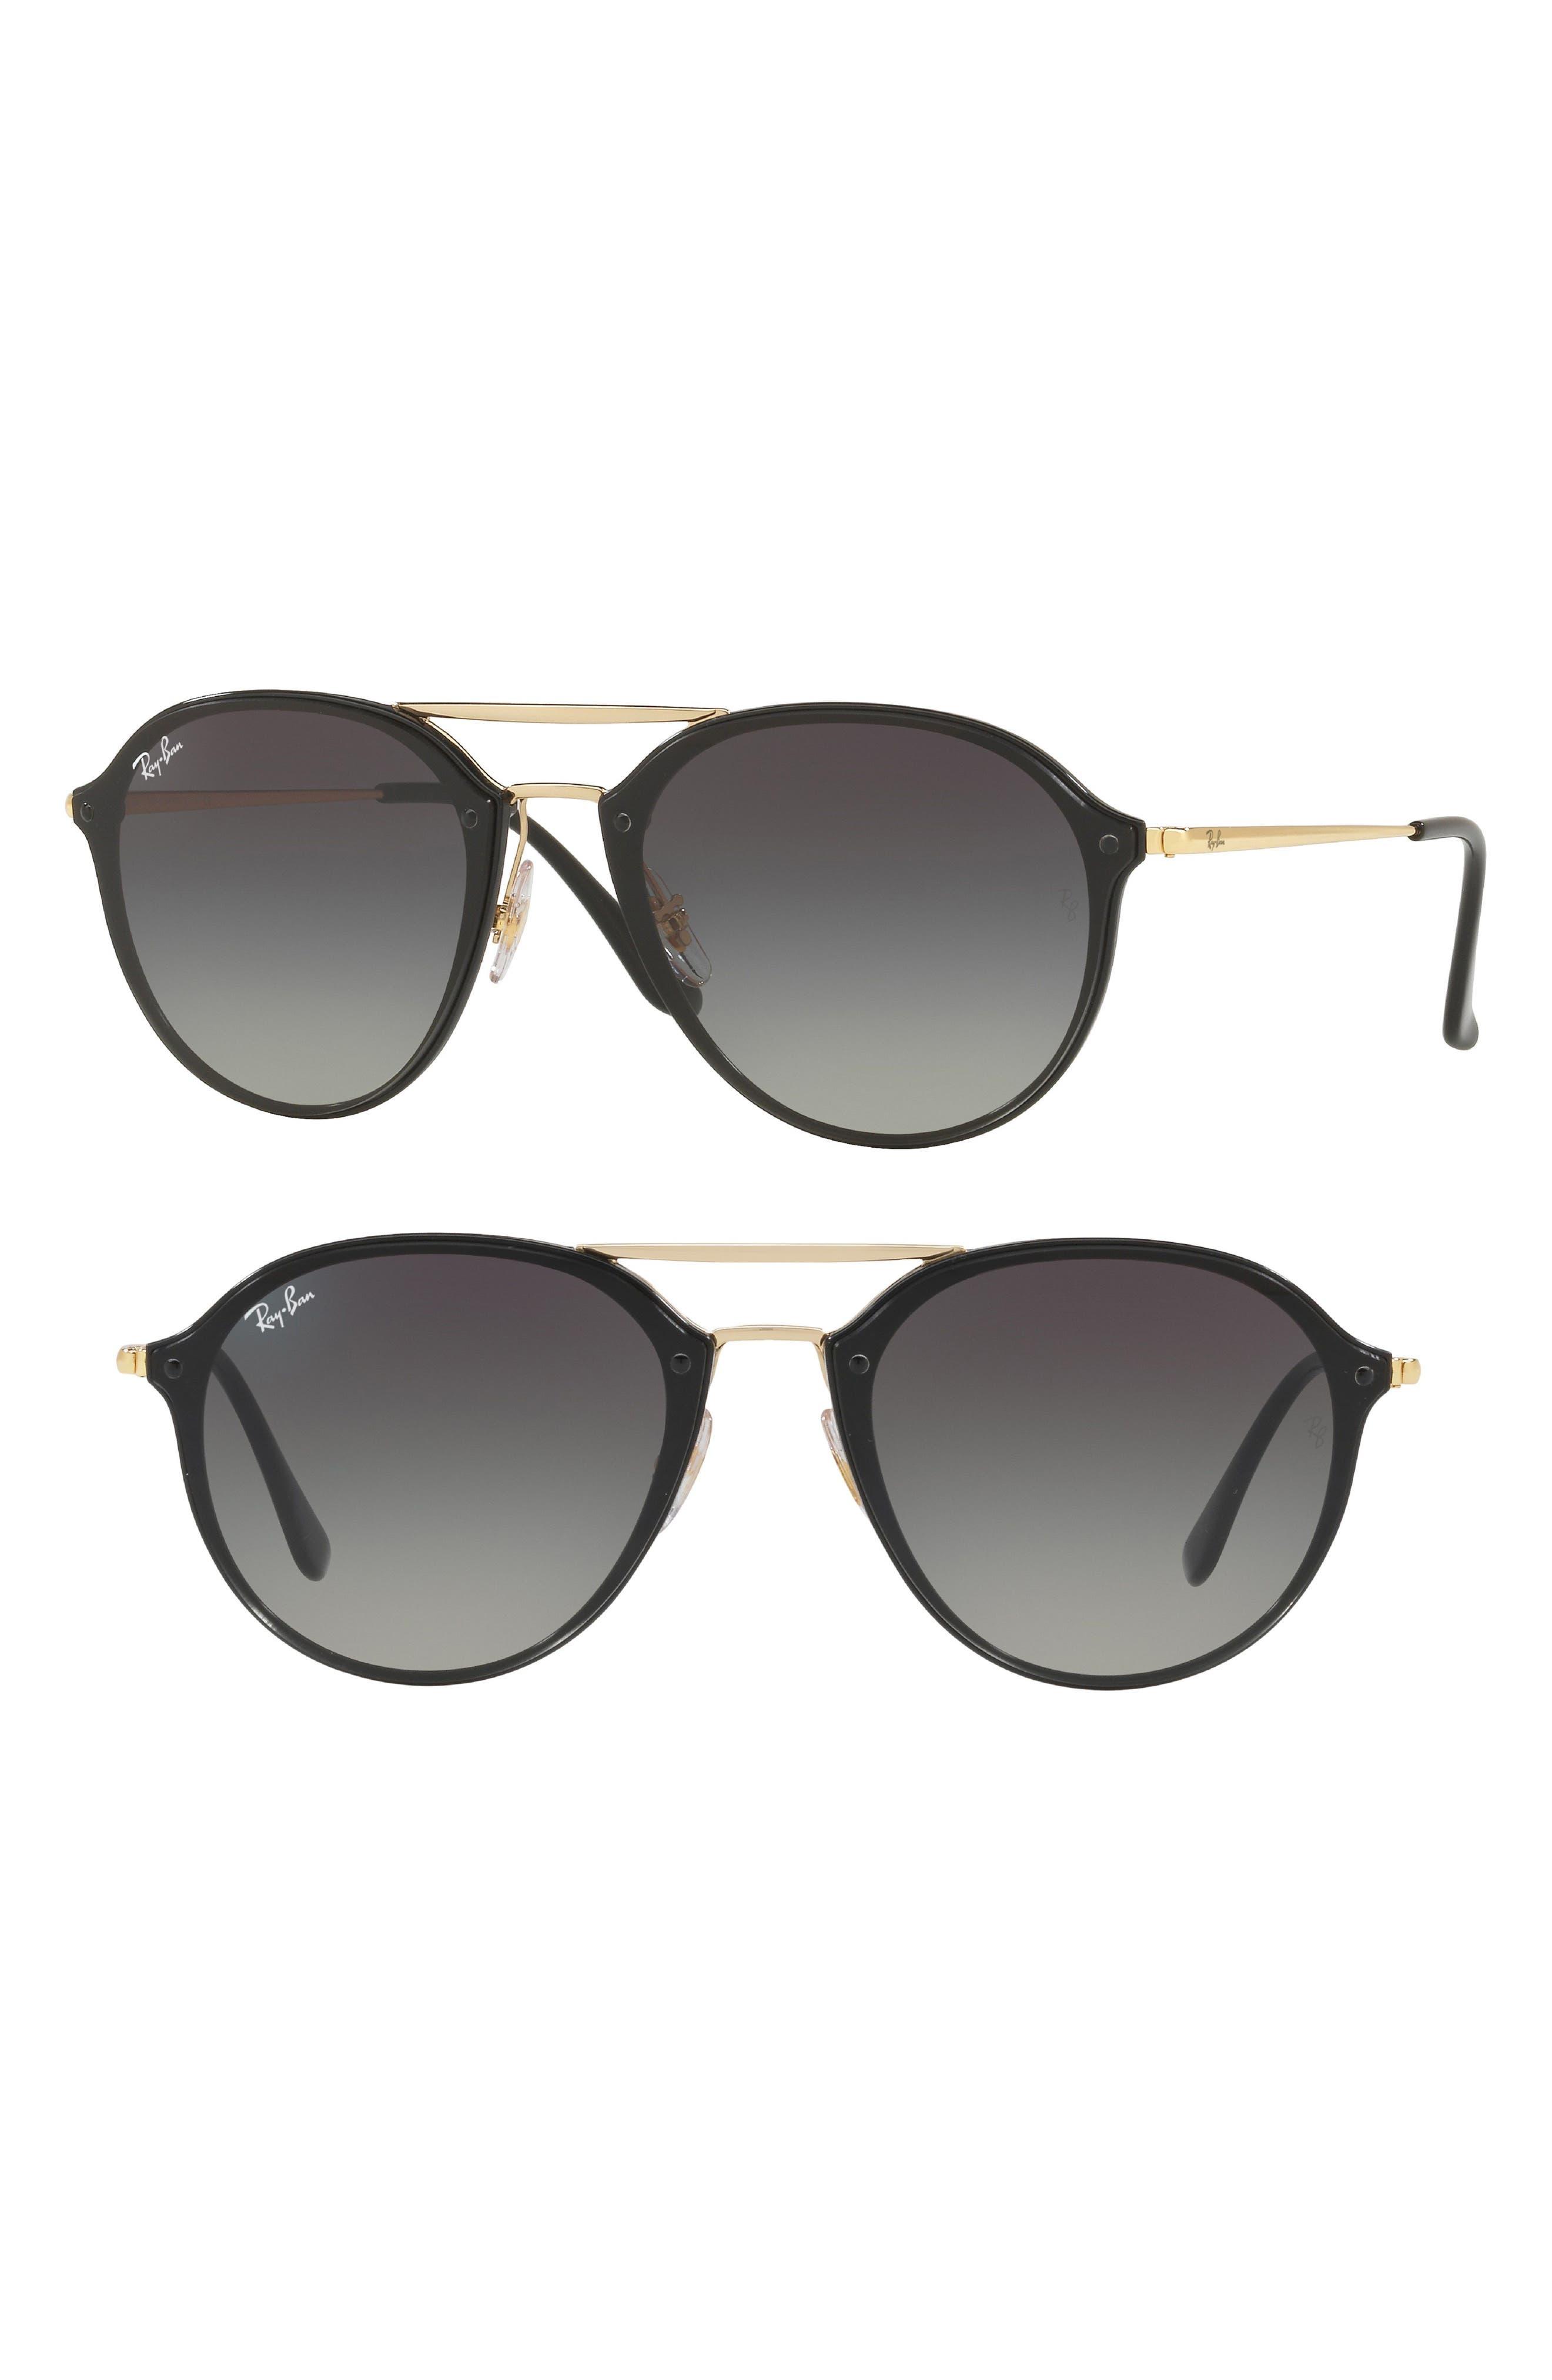 62mm Gradient Lens Aviator Sunglasses,                             Main thumbnail 1, color,                             BLACK